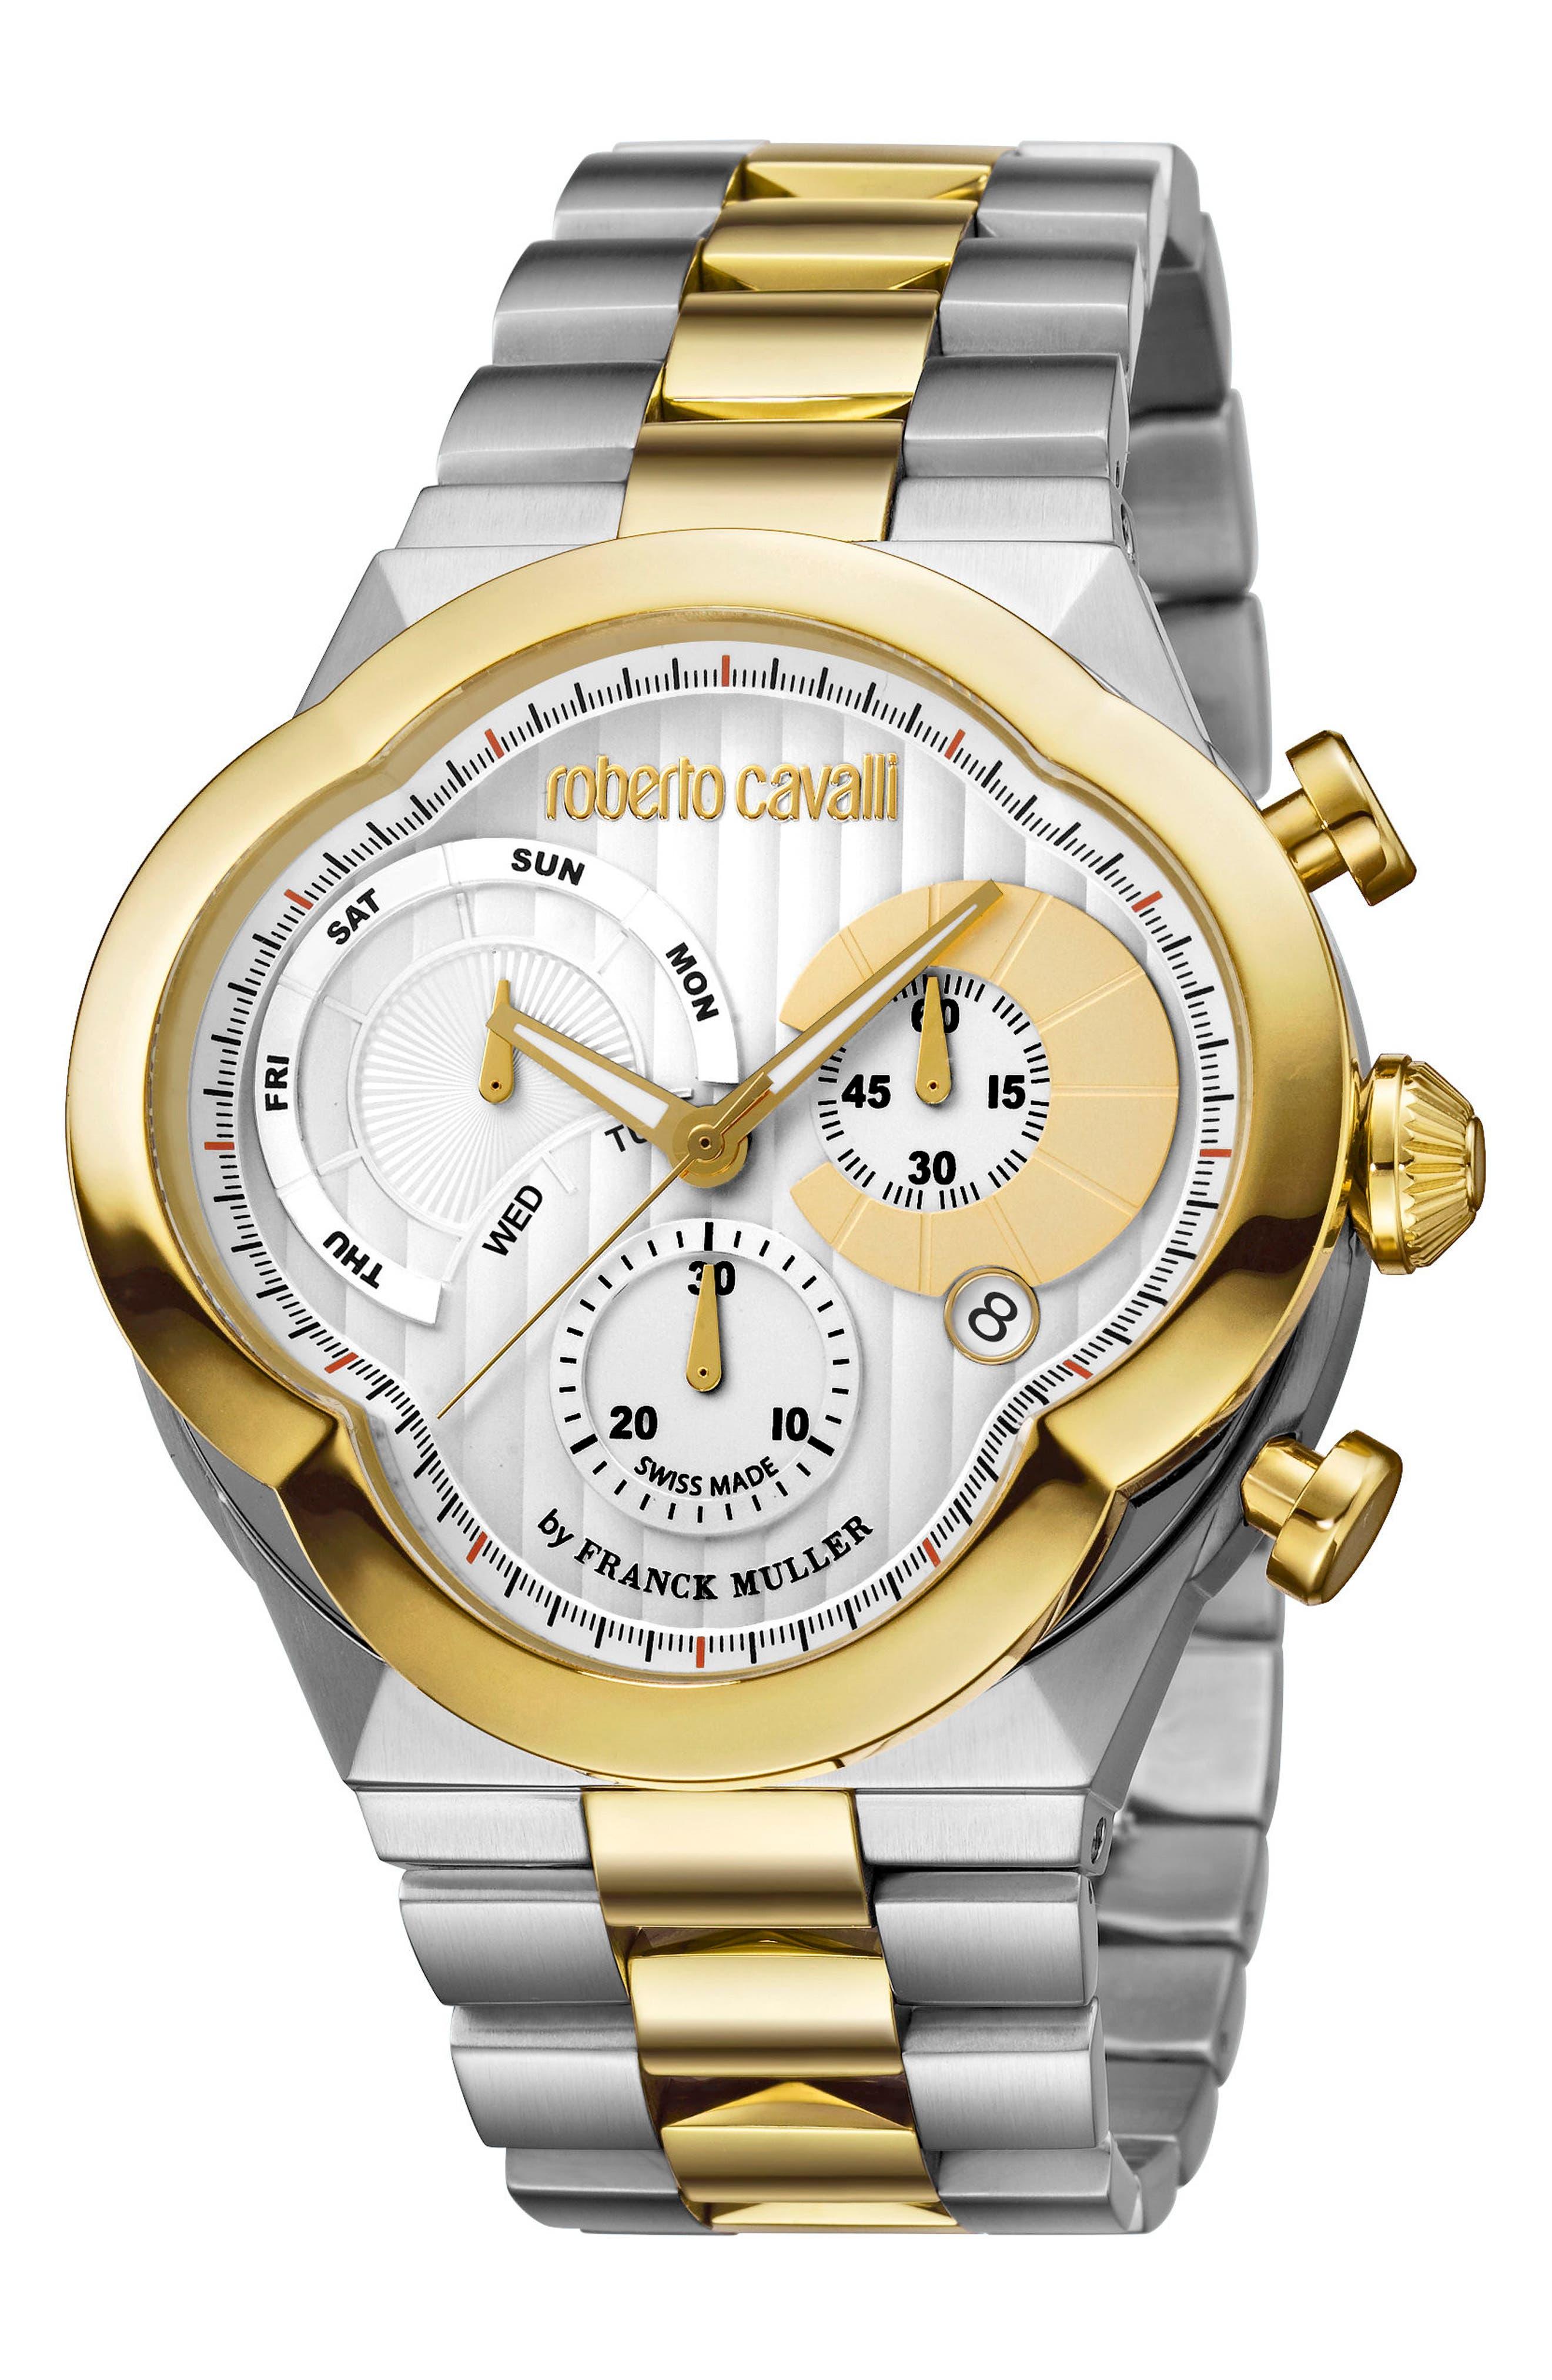 Roberto Cavalli by Franck Muller Clover Chronograph Bracelet Watch, 47mm